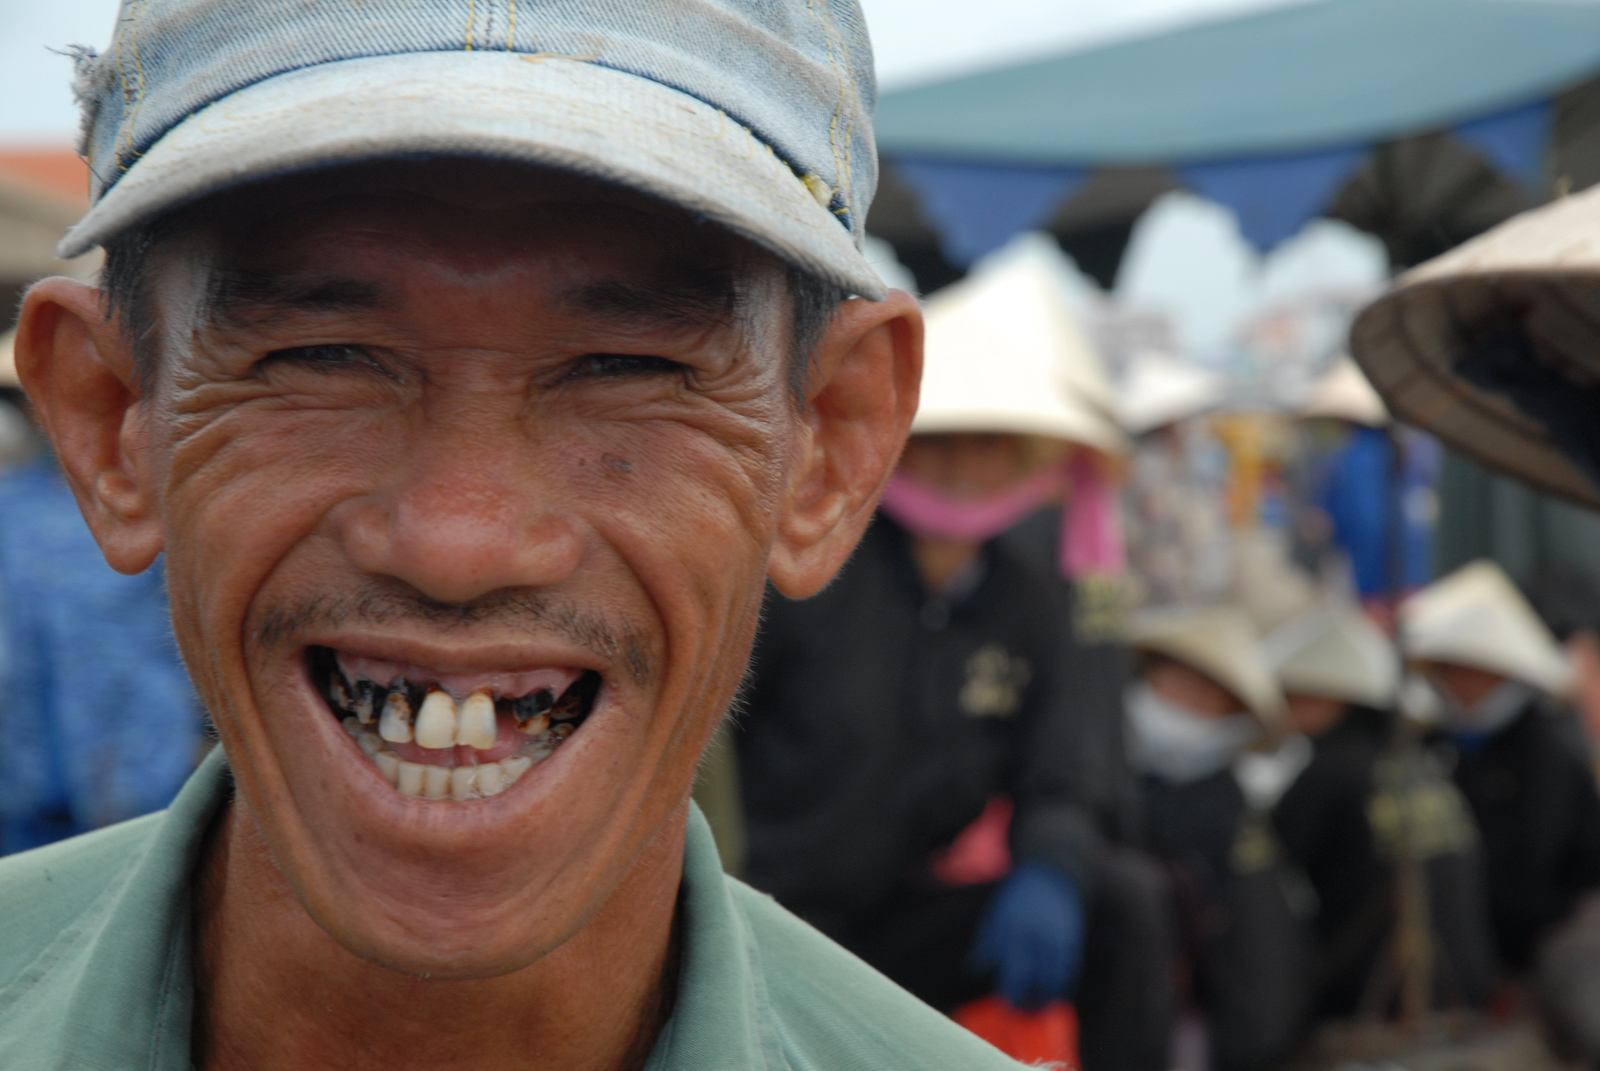 File:Big Smile 2.jpg